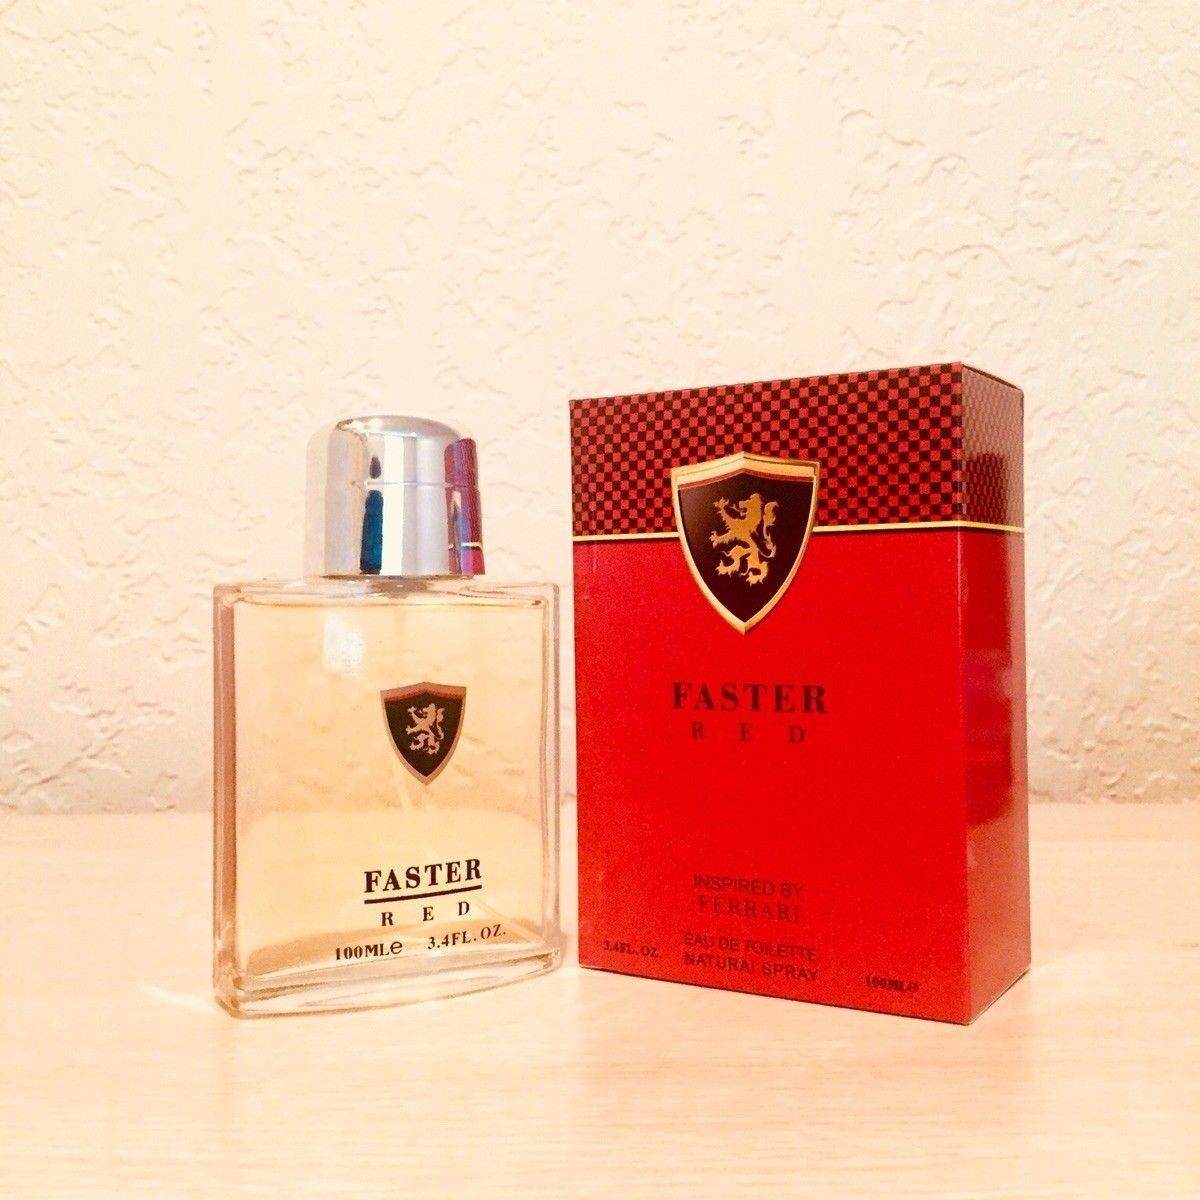 Faster Red Mens Perfume Inspired By Ferrari 3 4 Fl Oz 100mle Brand New Men Perfume Perfume Eau De Toilette